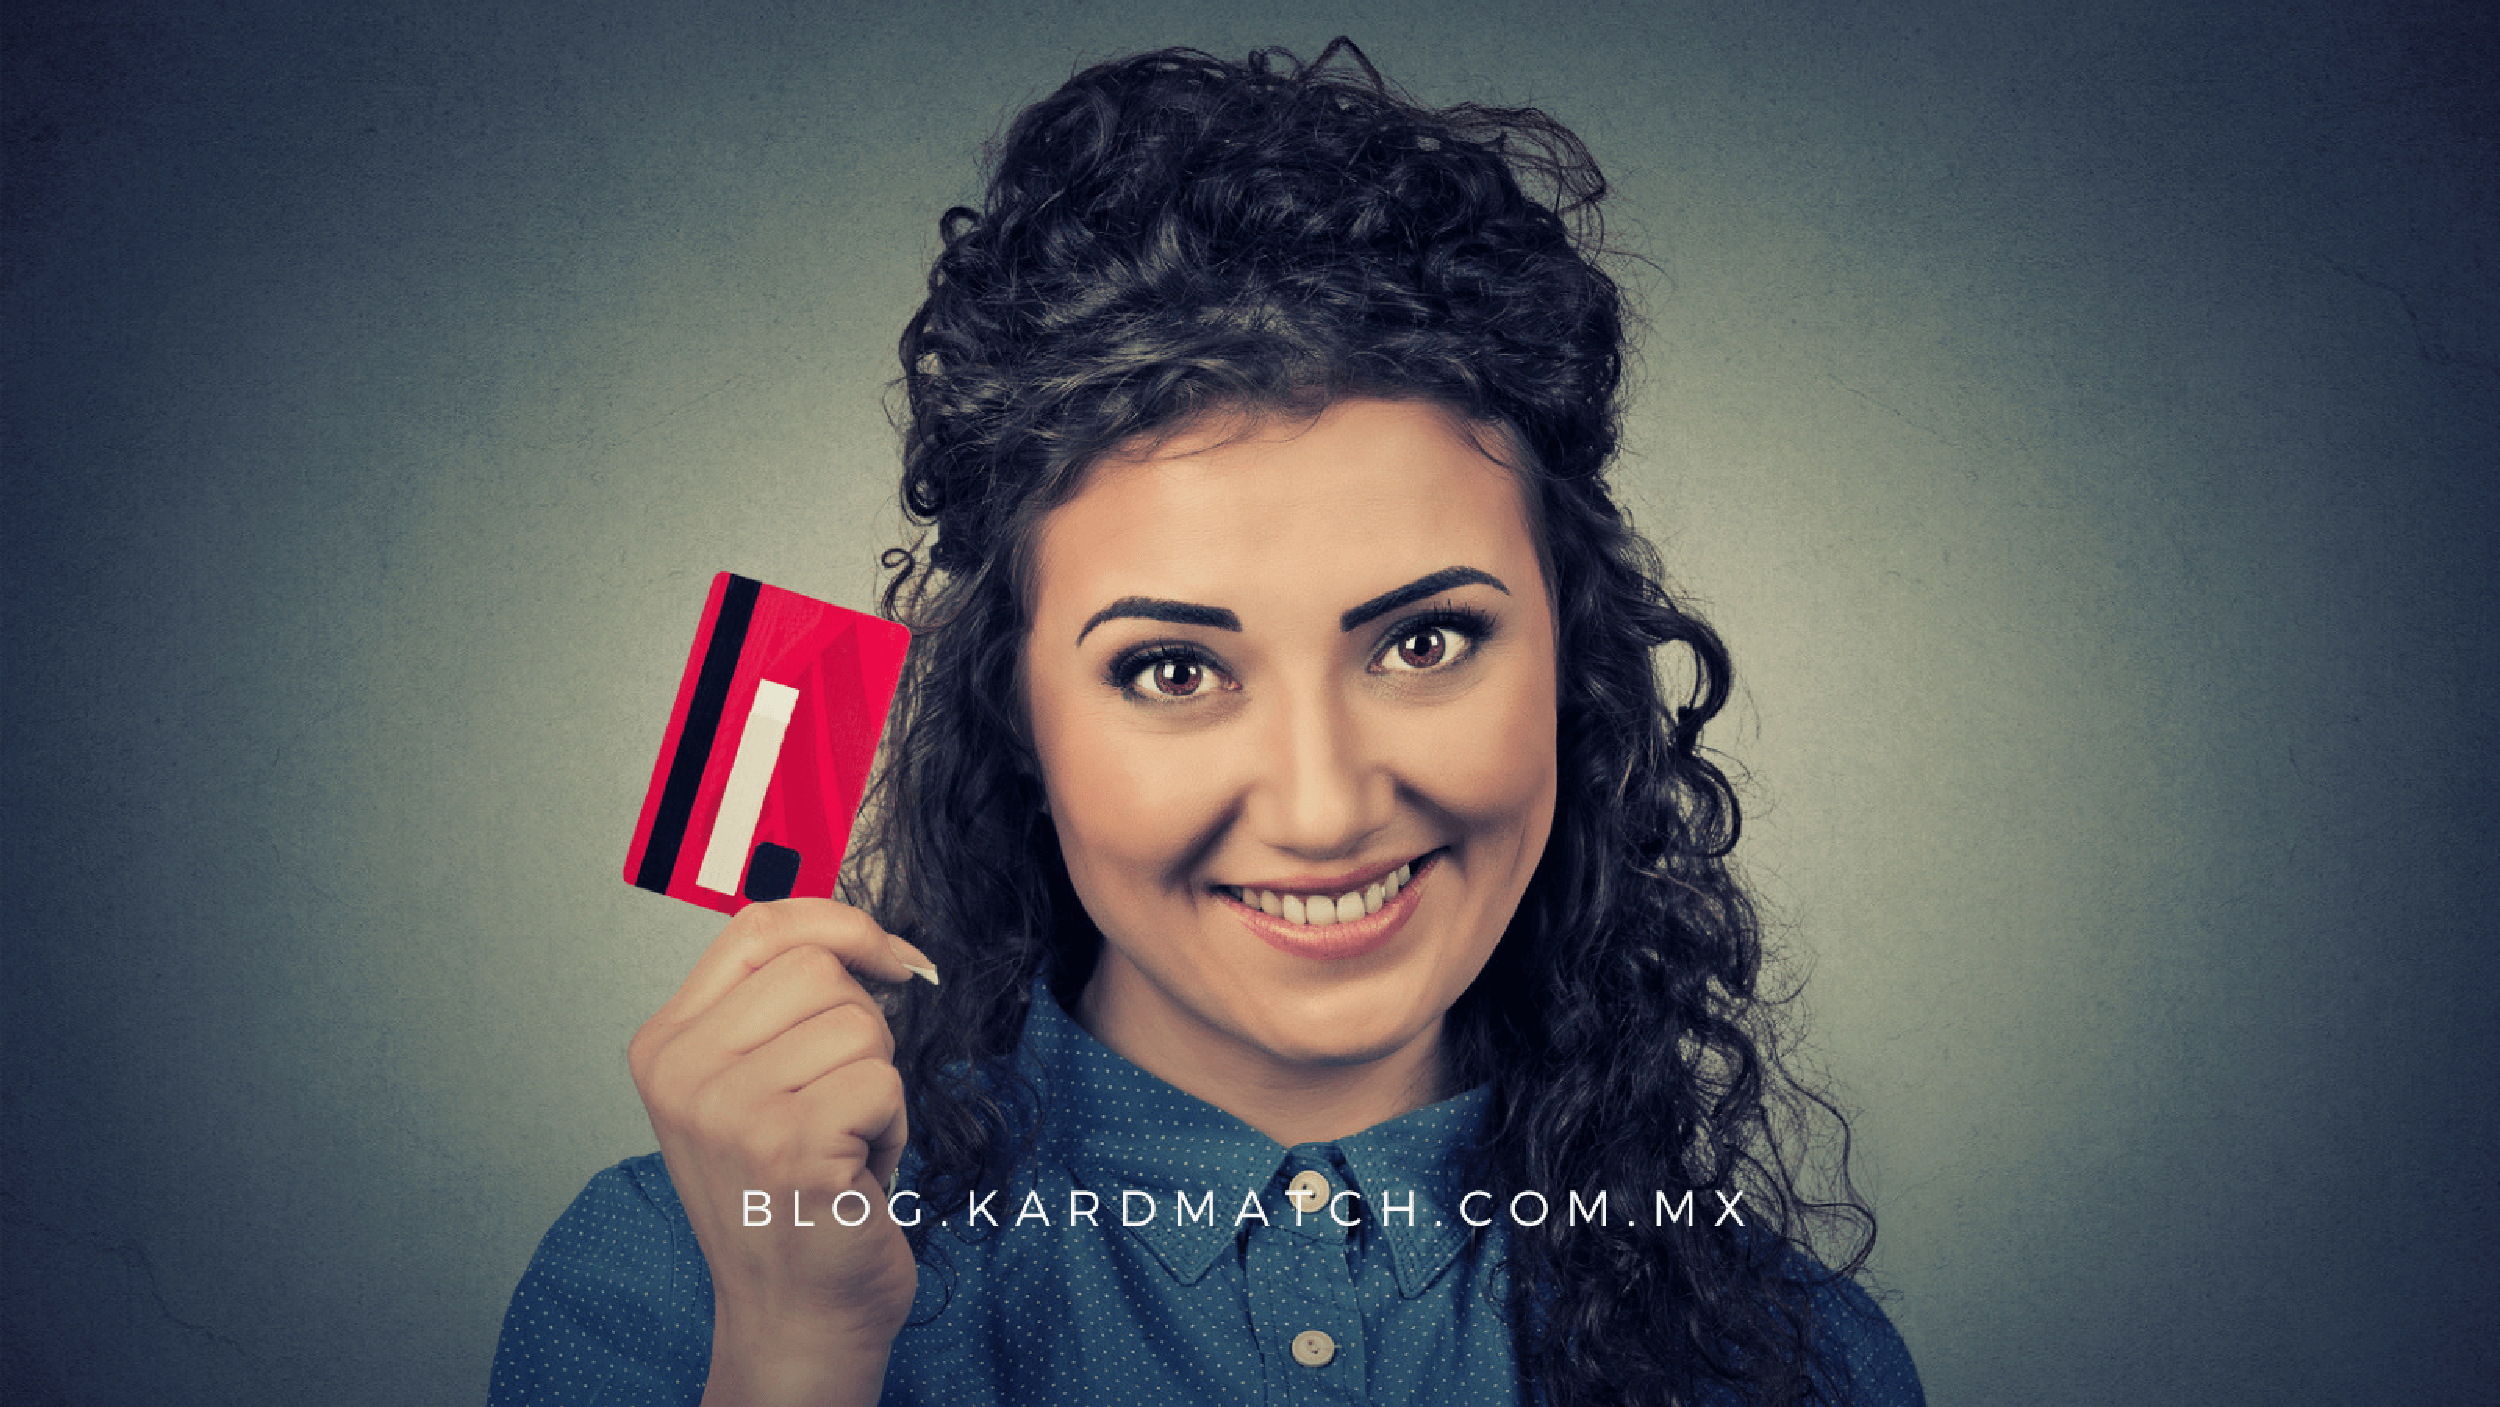 tarjetas-de-credito-para-jovenes.png